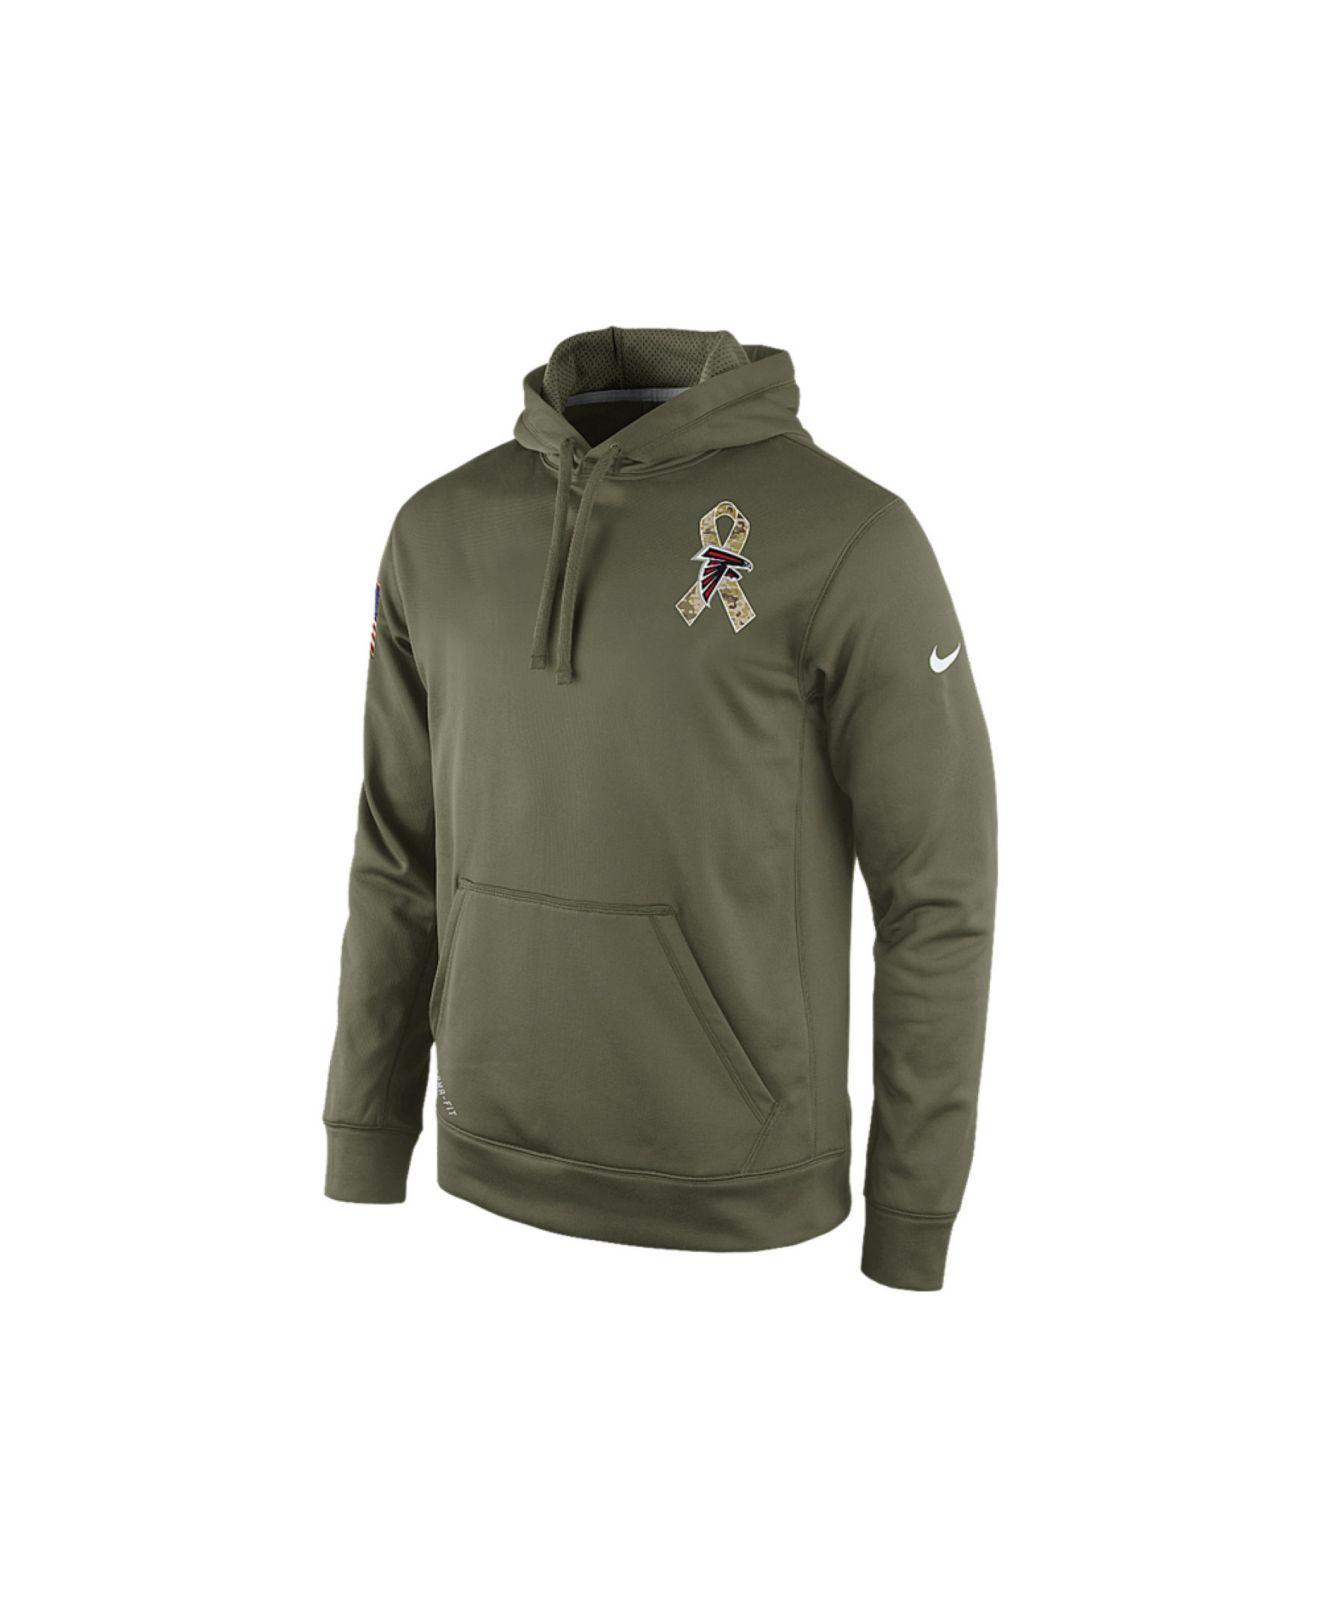 1dd60c083a3 Nike Atlanta Falcons Nfl Mens Salute To Service Ko Hoodie in Green ...